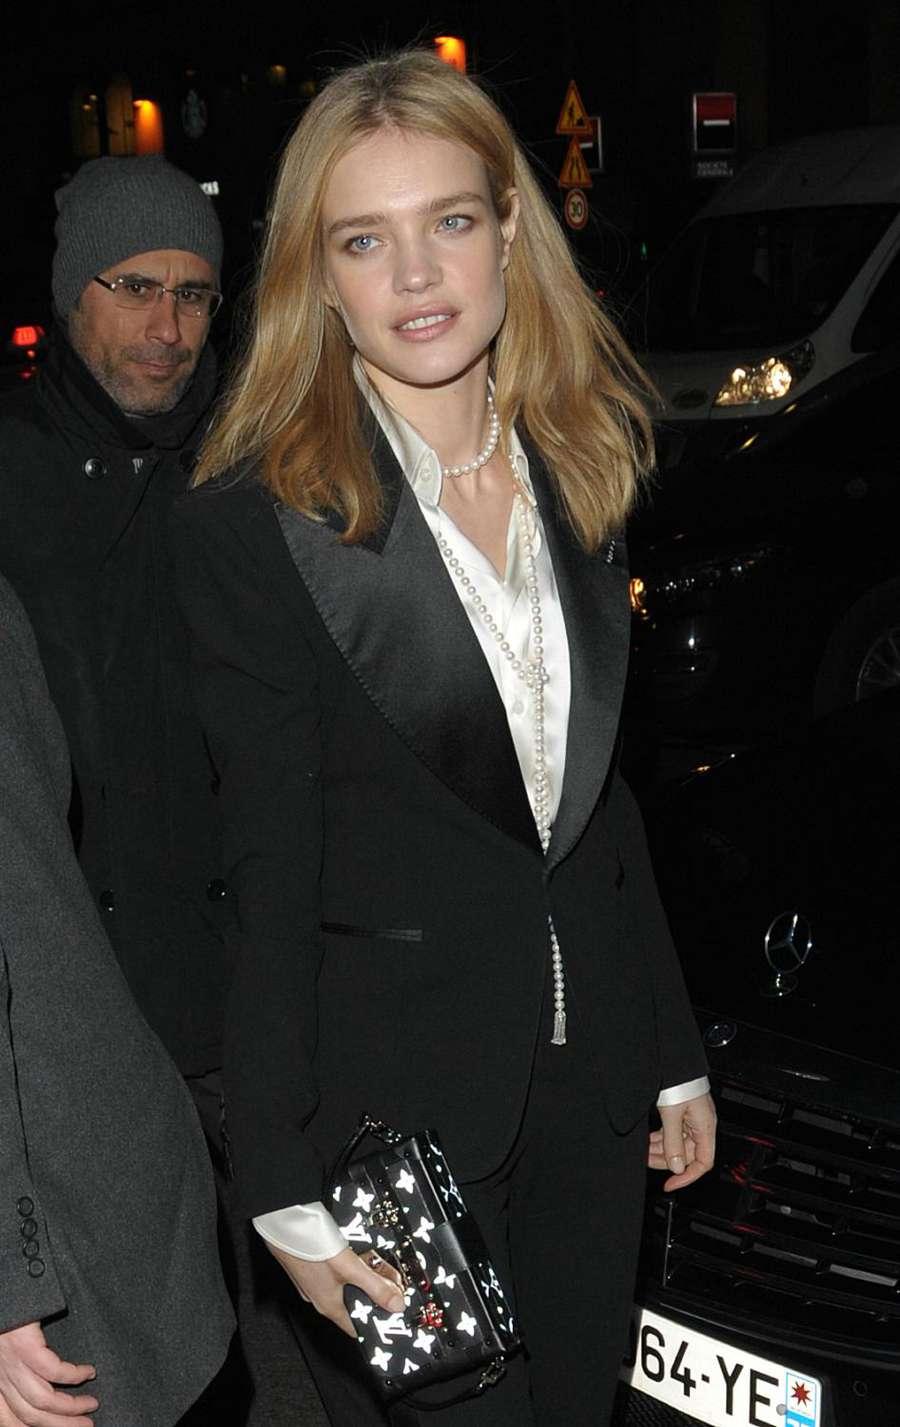 Natalia Vodianova - Arrives at Berluti Fashion Event in Paris